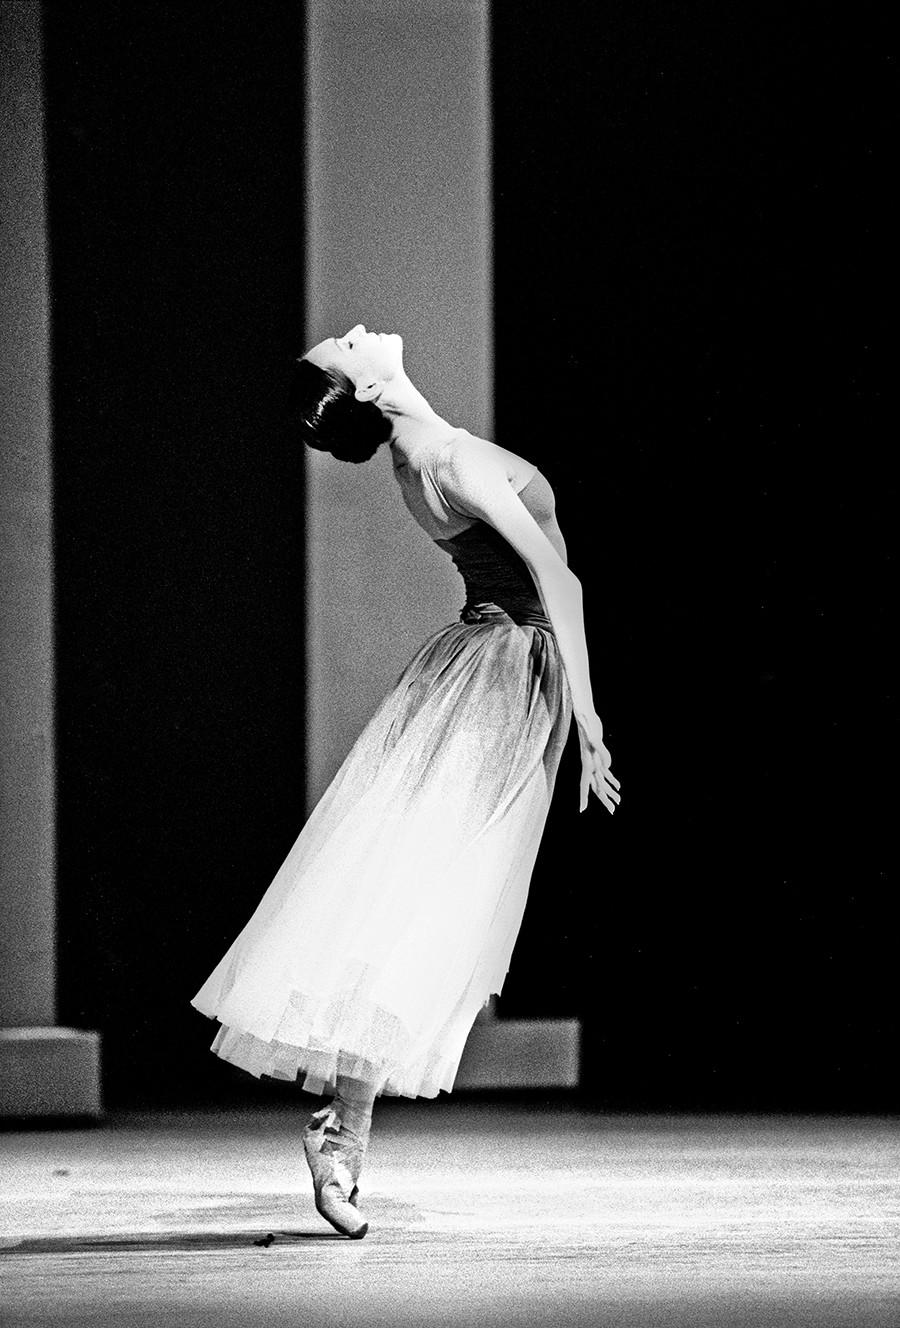 Bolschoi-Ensemble auf Tour in London, 2016